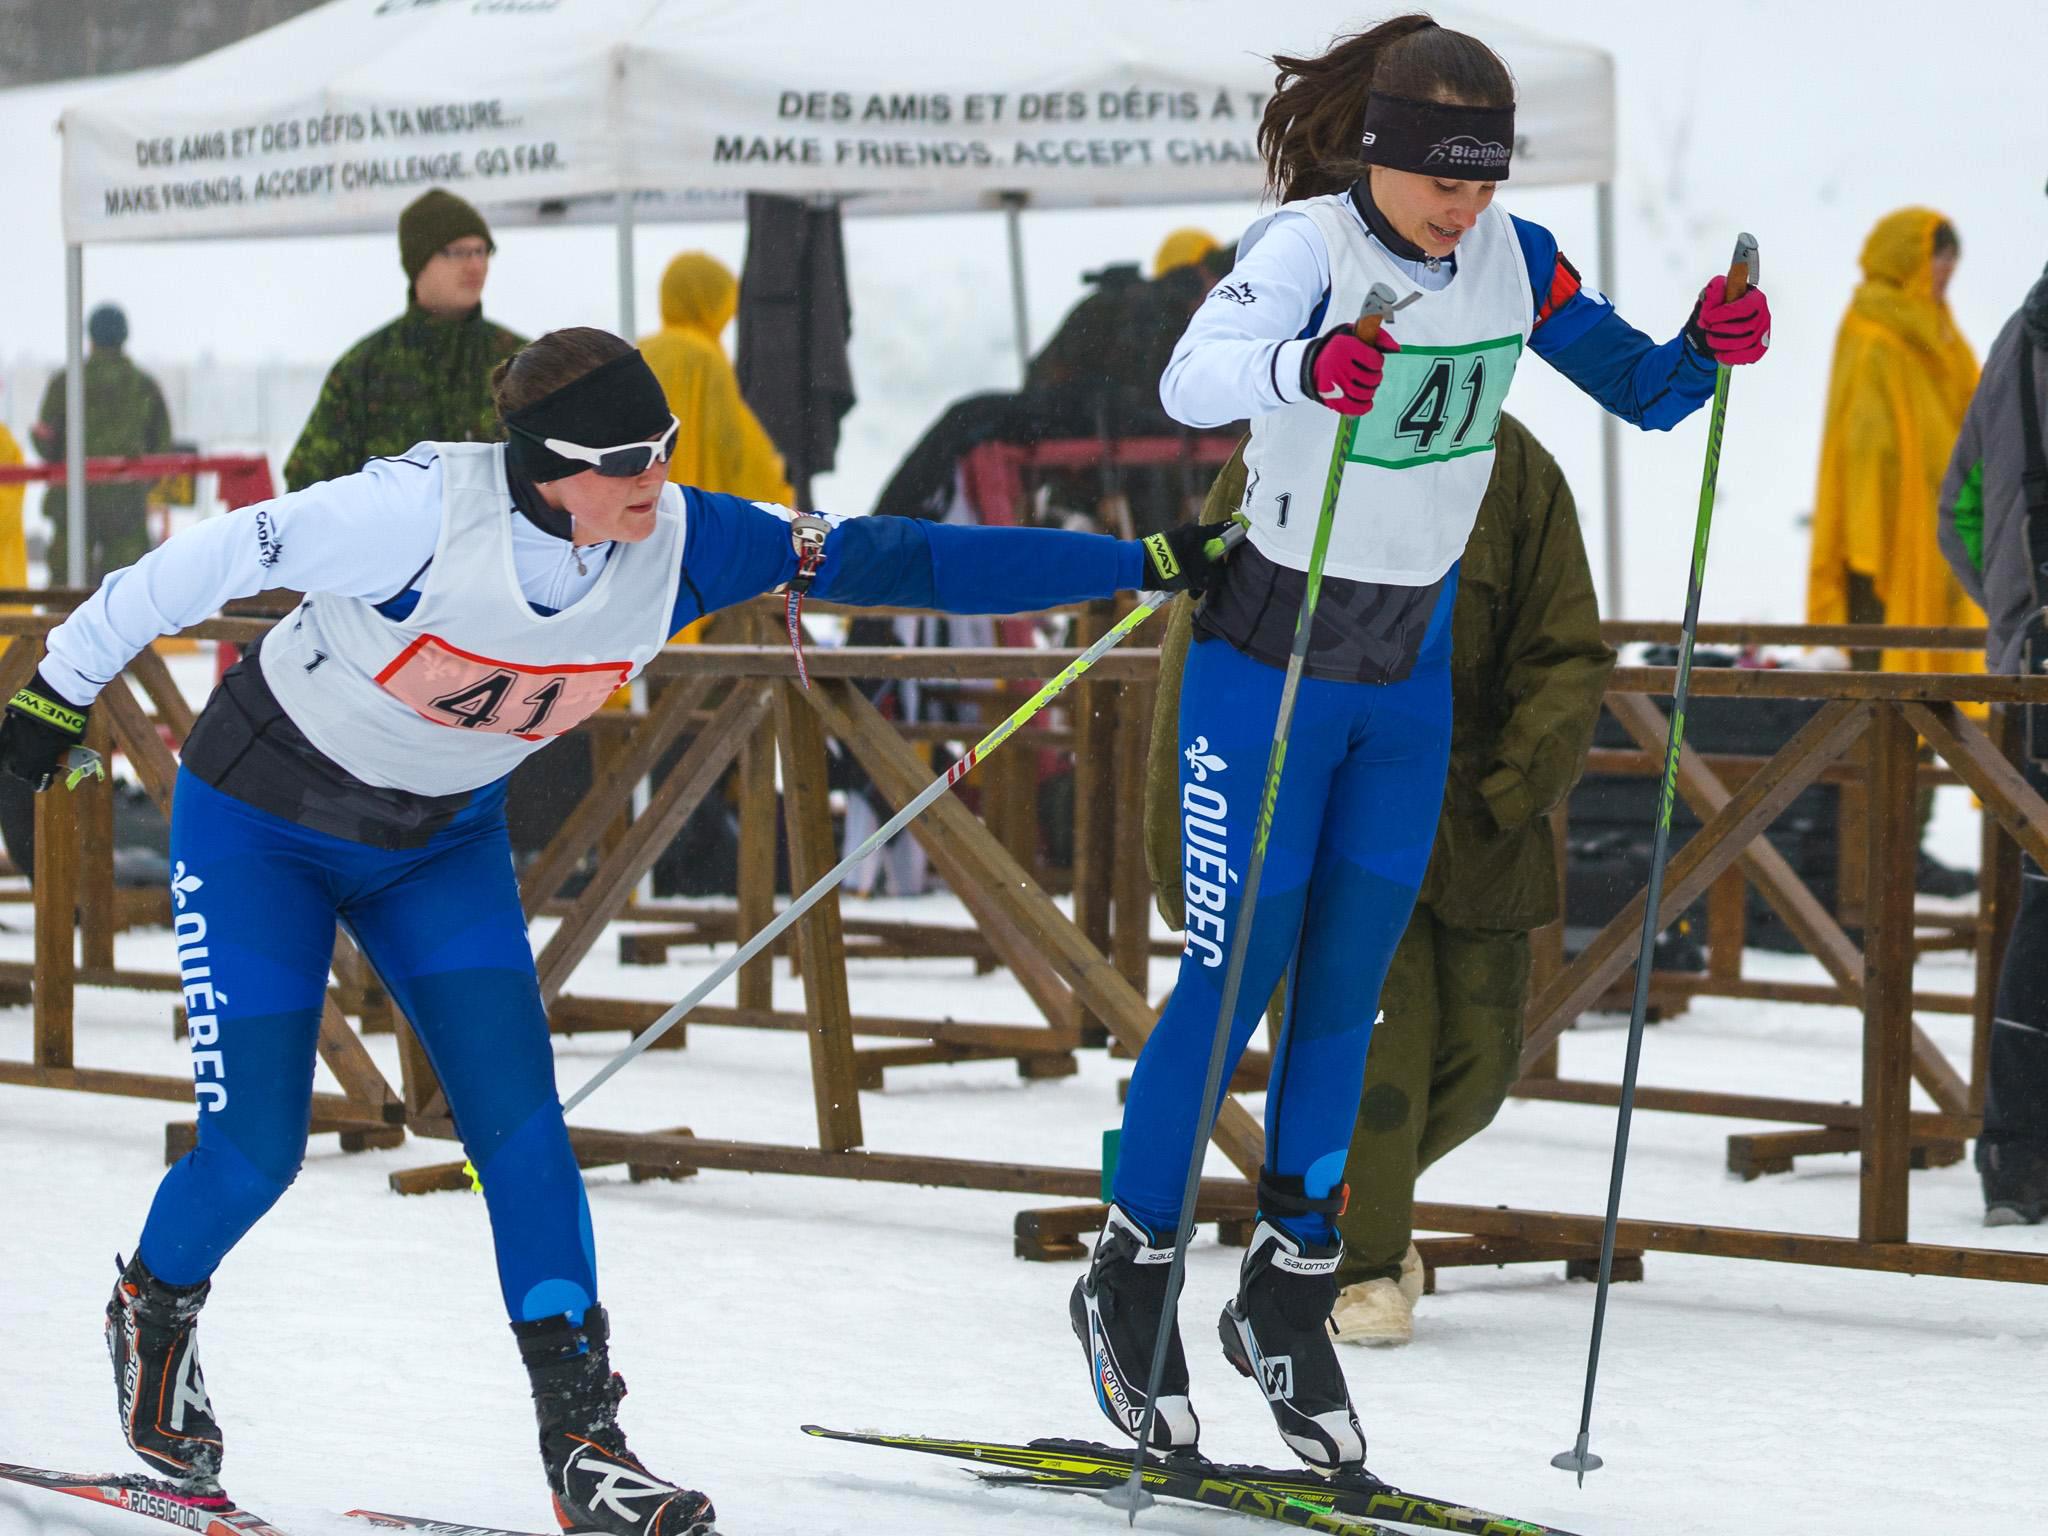 Cadet Anne Morcet (left) tags her Team Quebec teammate Cadet   Geneviève Harvey during the relay race at the Cadet National Biathlon Championship on March 1, 2017 at the Myriam Bédard Biathlon Centre.